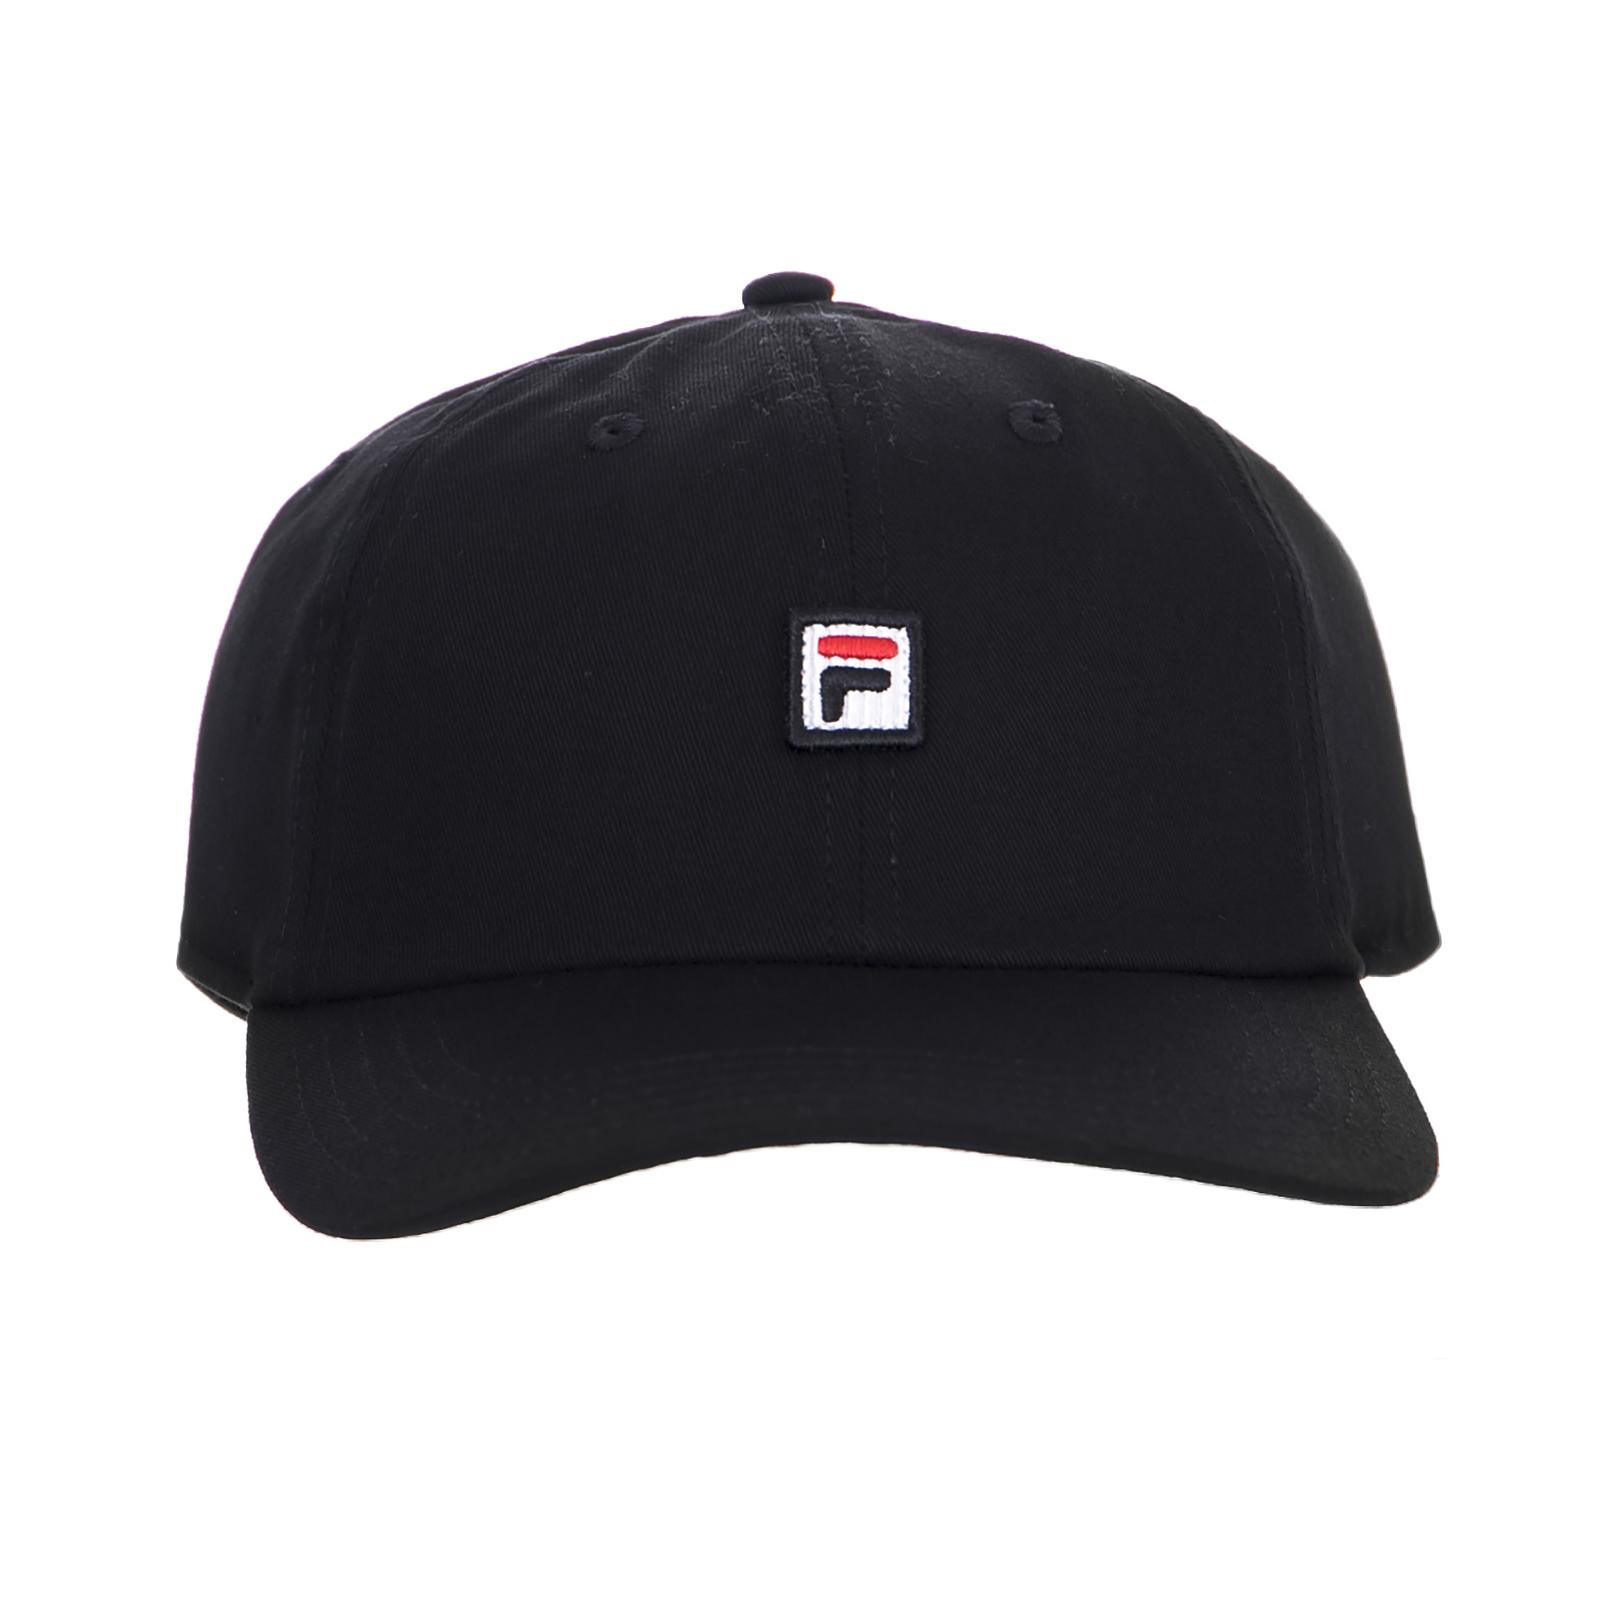 fila cappelli p re casquette sangle derri re black noir ebay. Black Bedroom Furniture Sets. Home Design Ideas